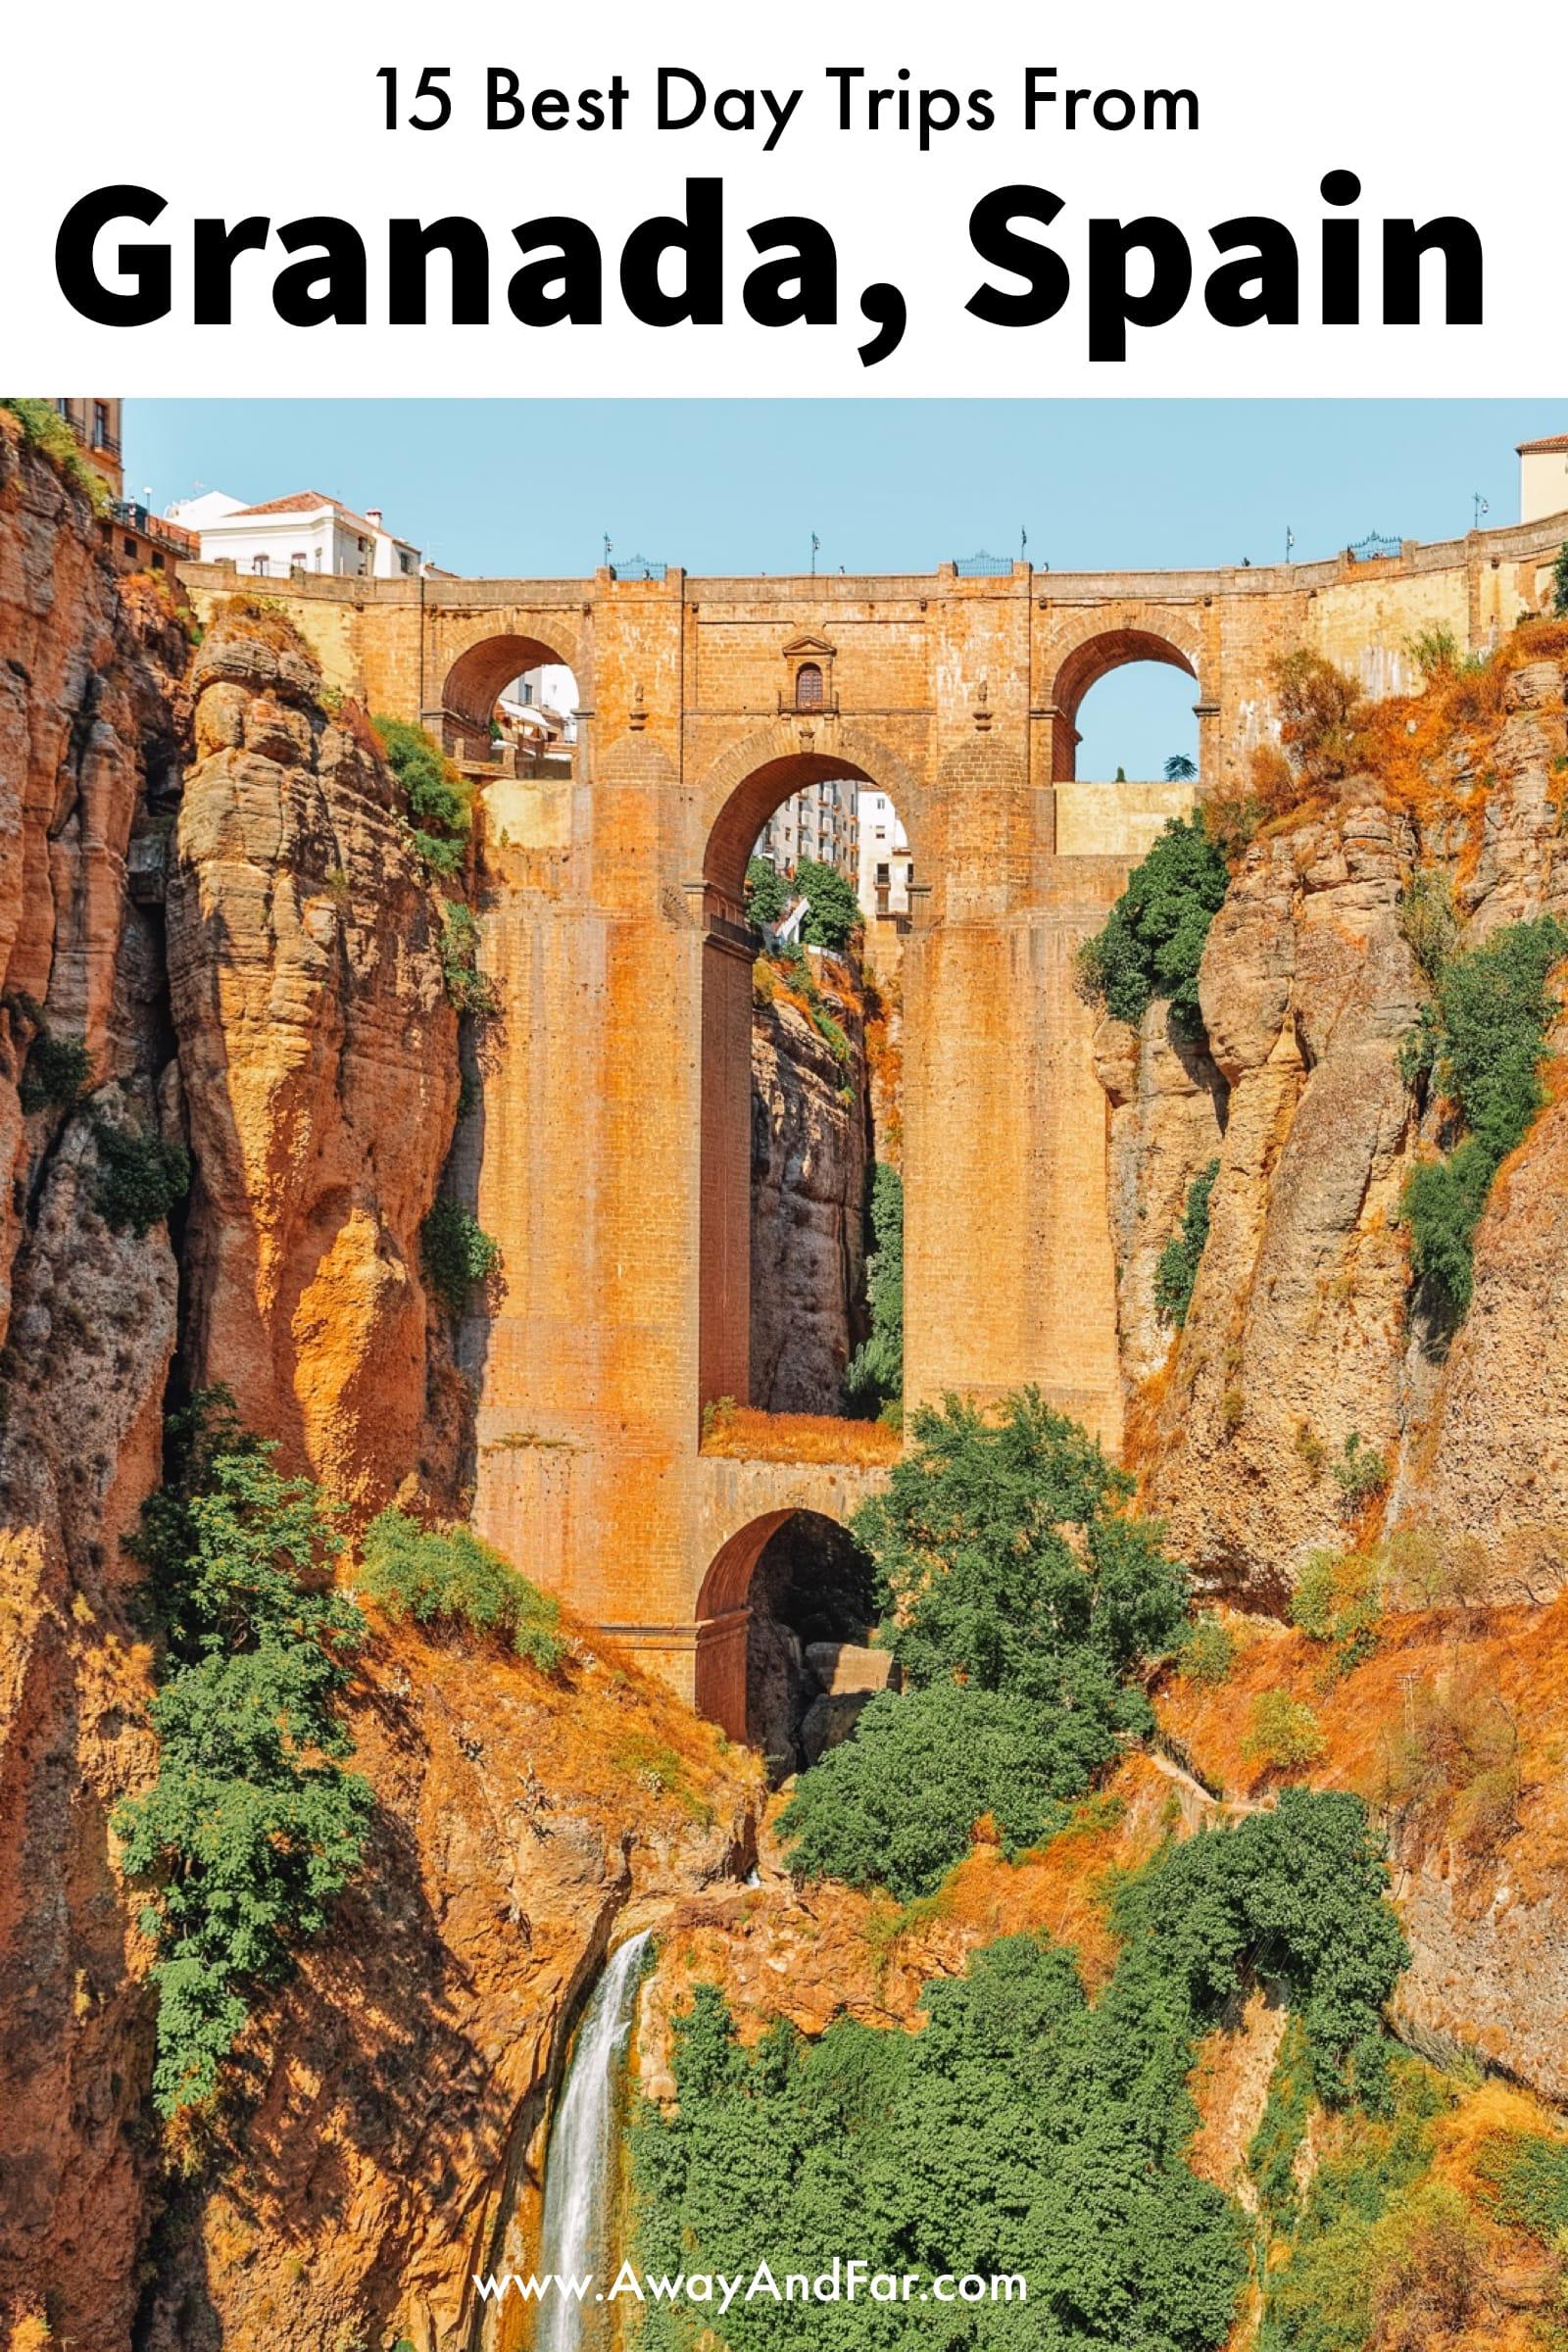 15 Best Day Trips From Granada, Spain (1)